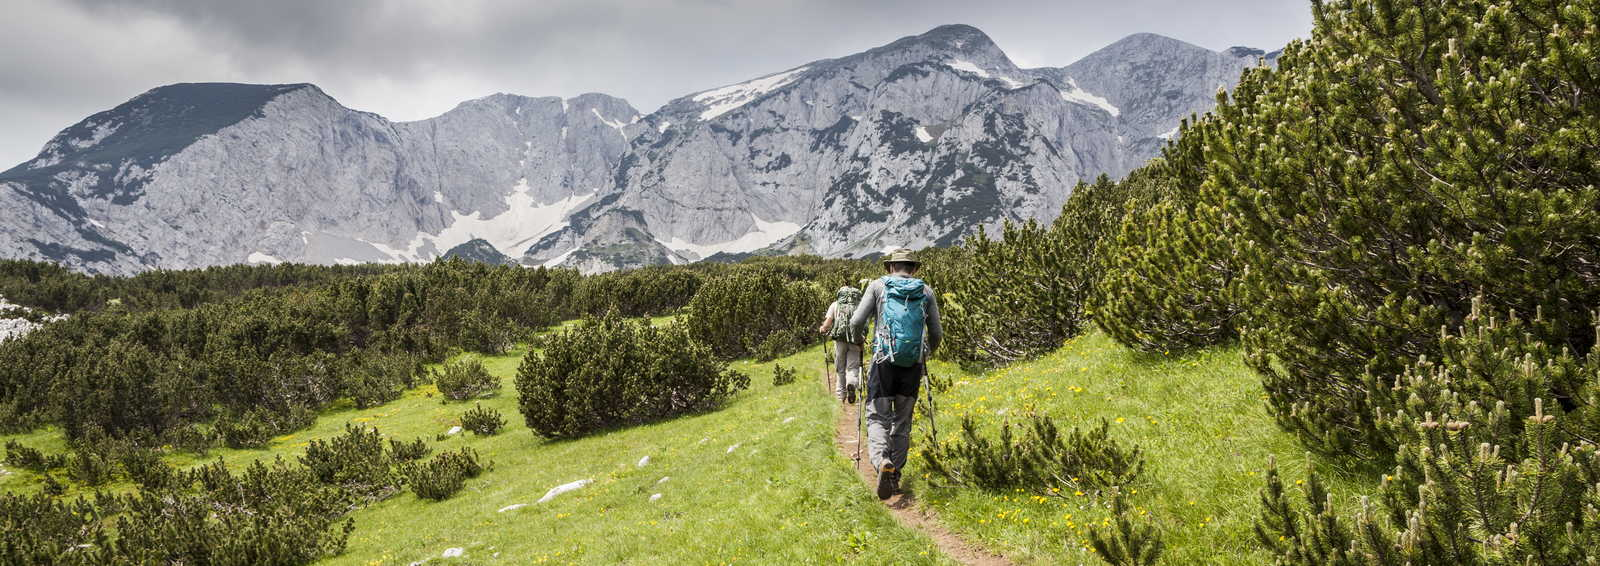 Trekking in Sutjeska N.P